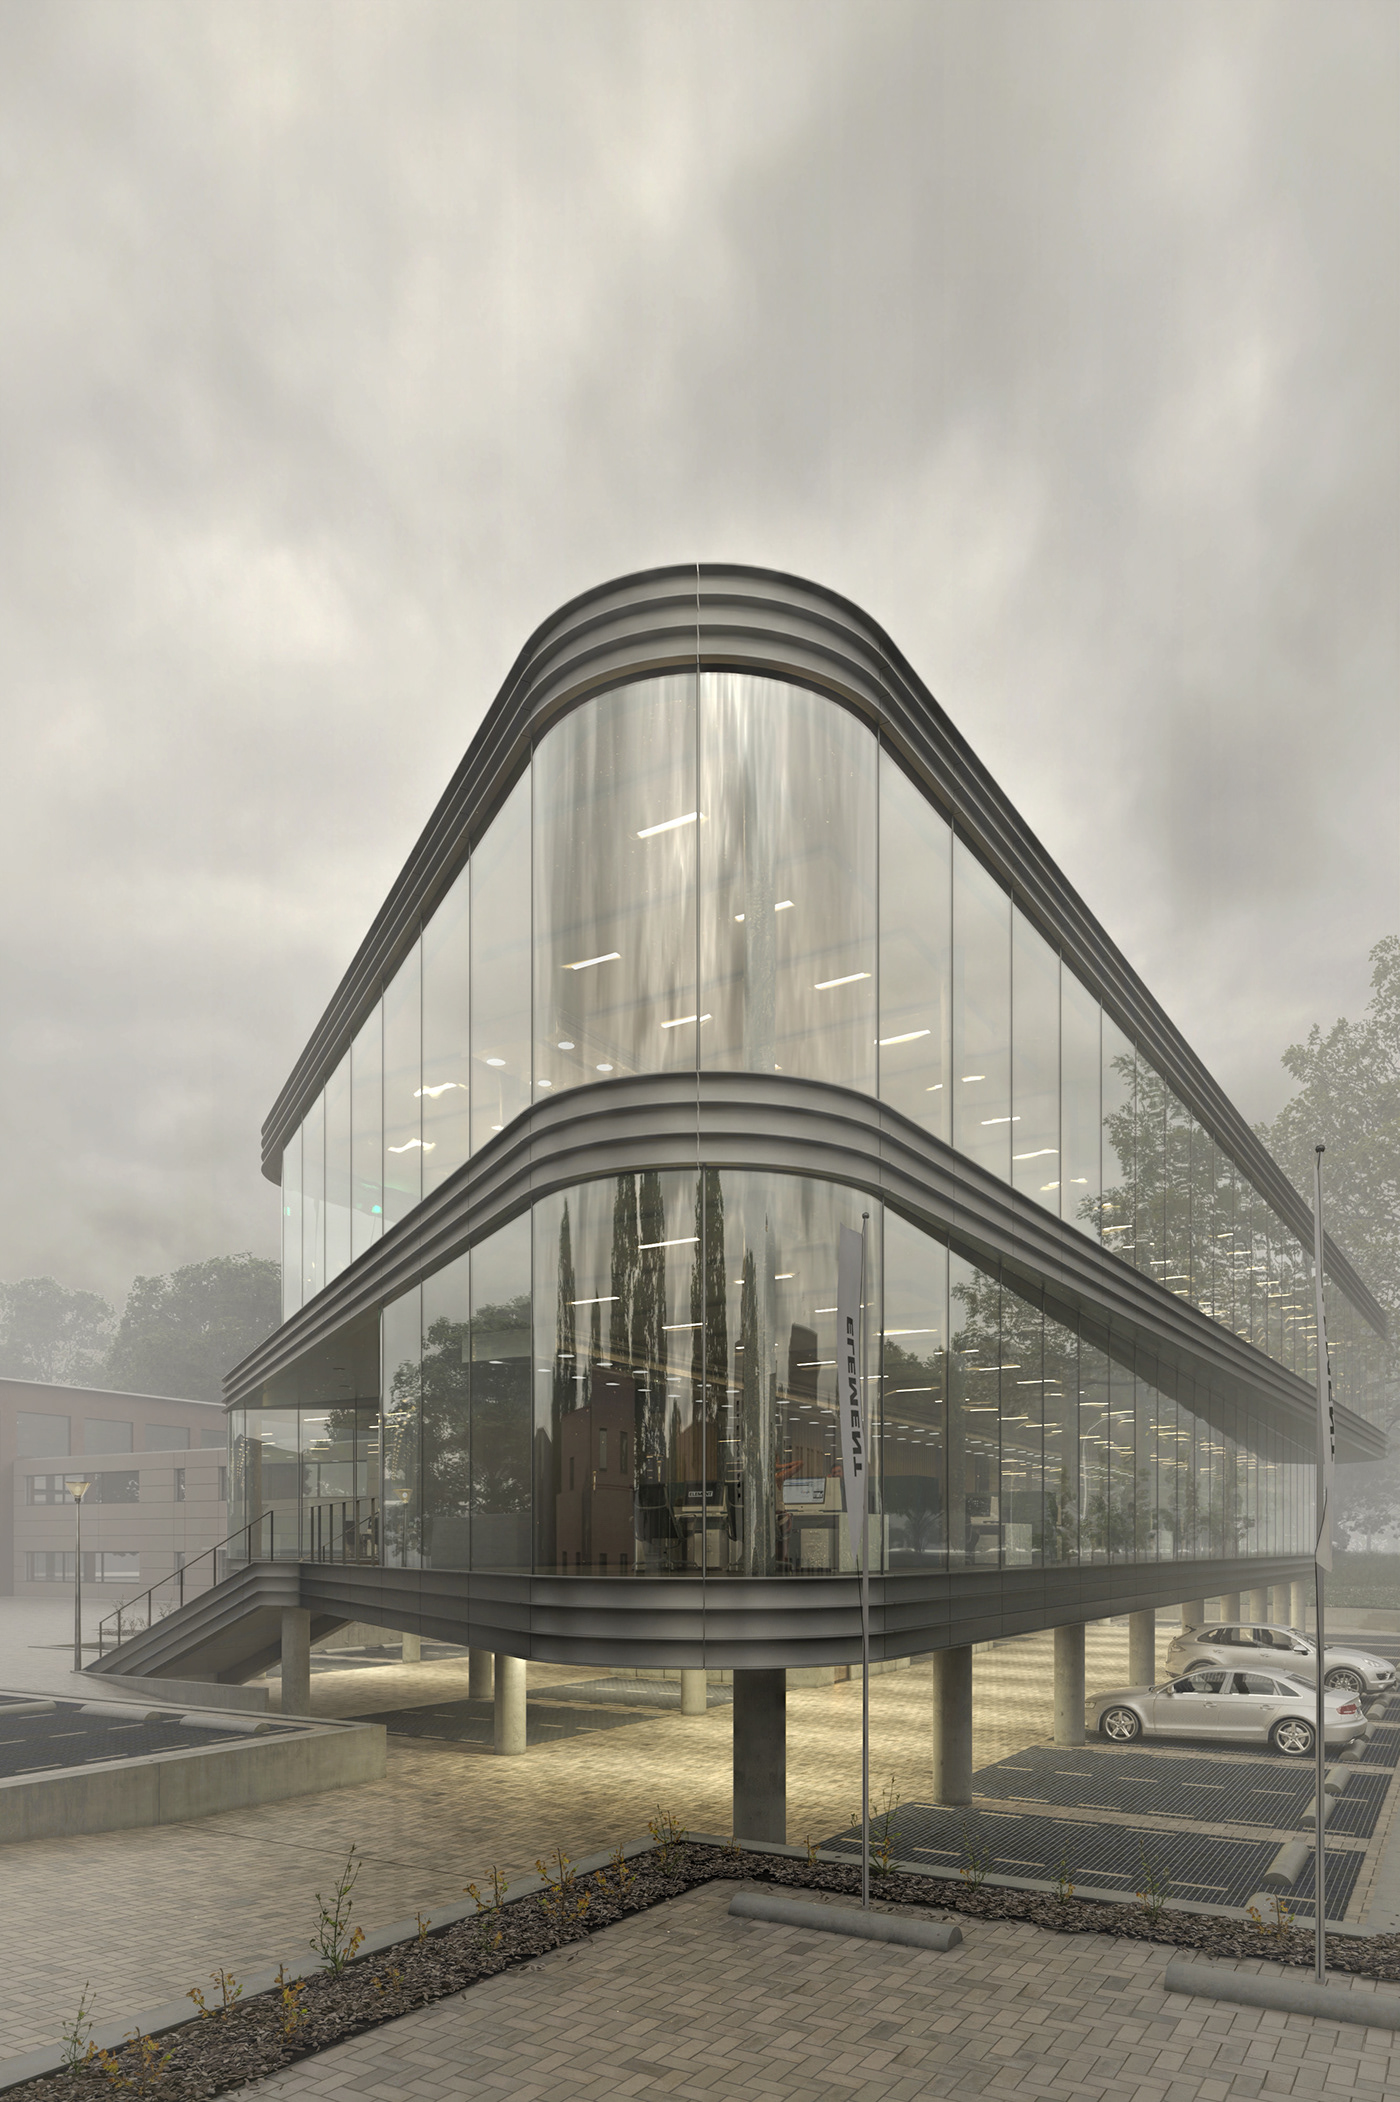 architecture design 3dvisualization 3drender photoshop